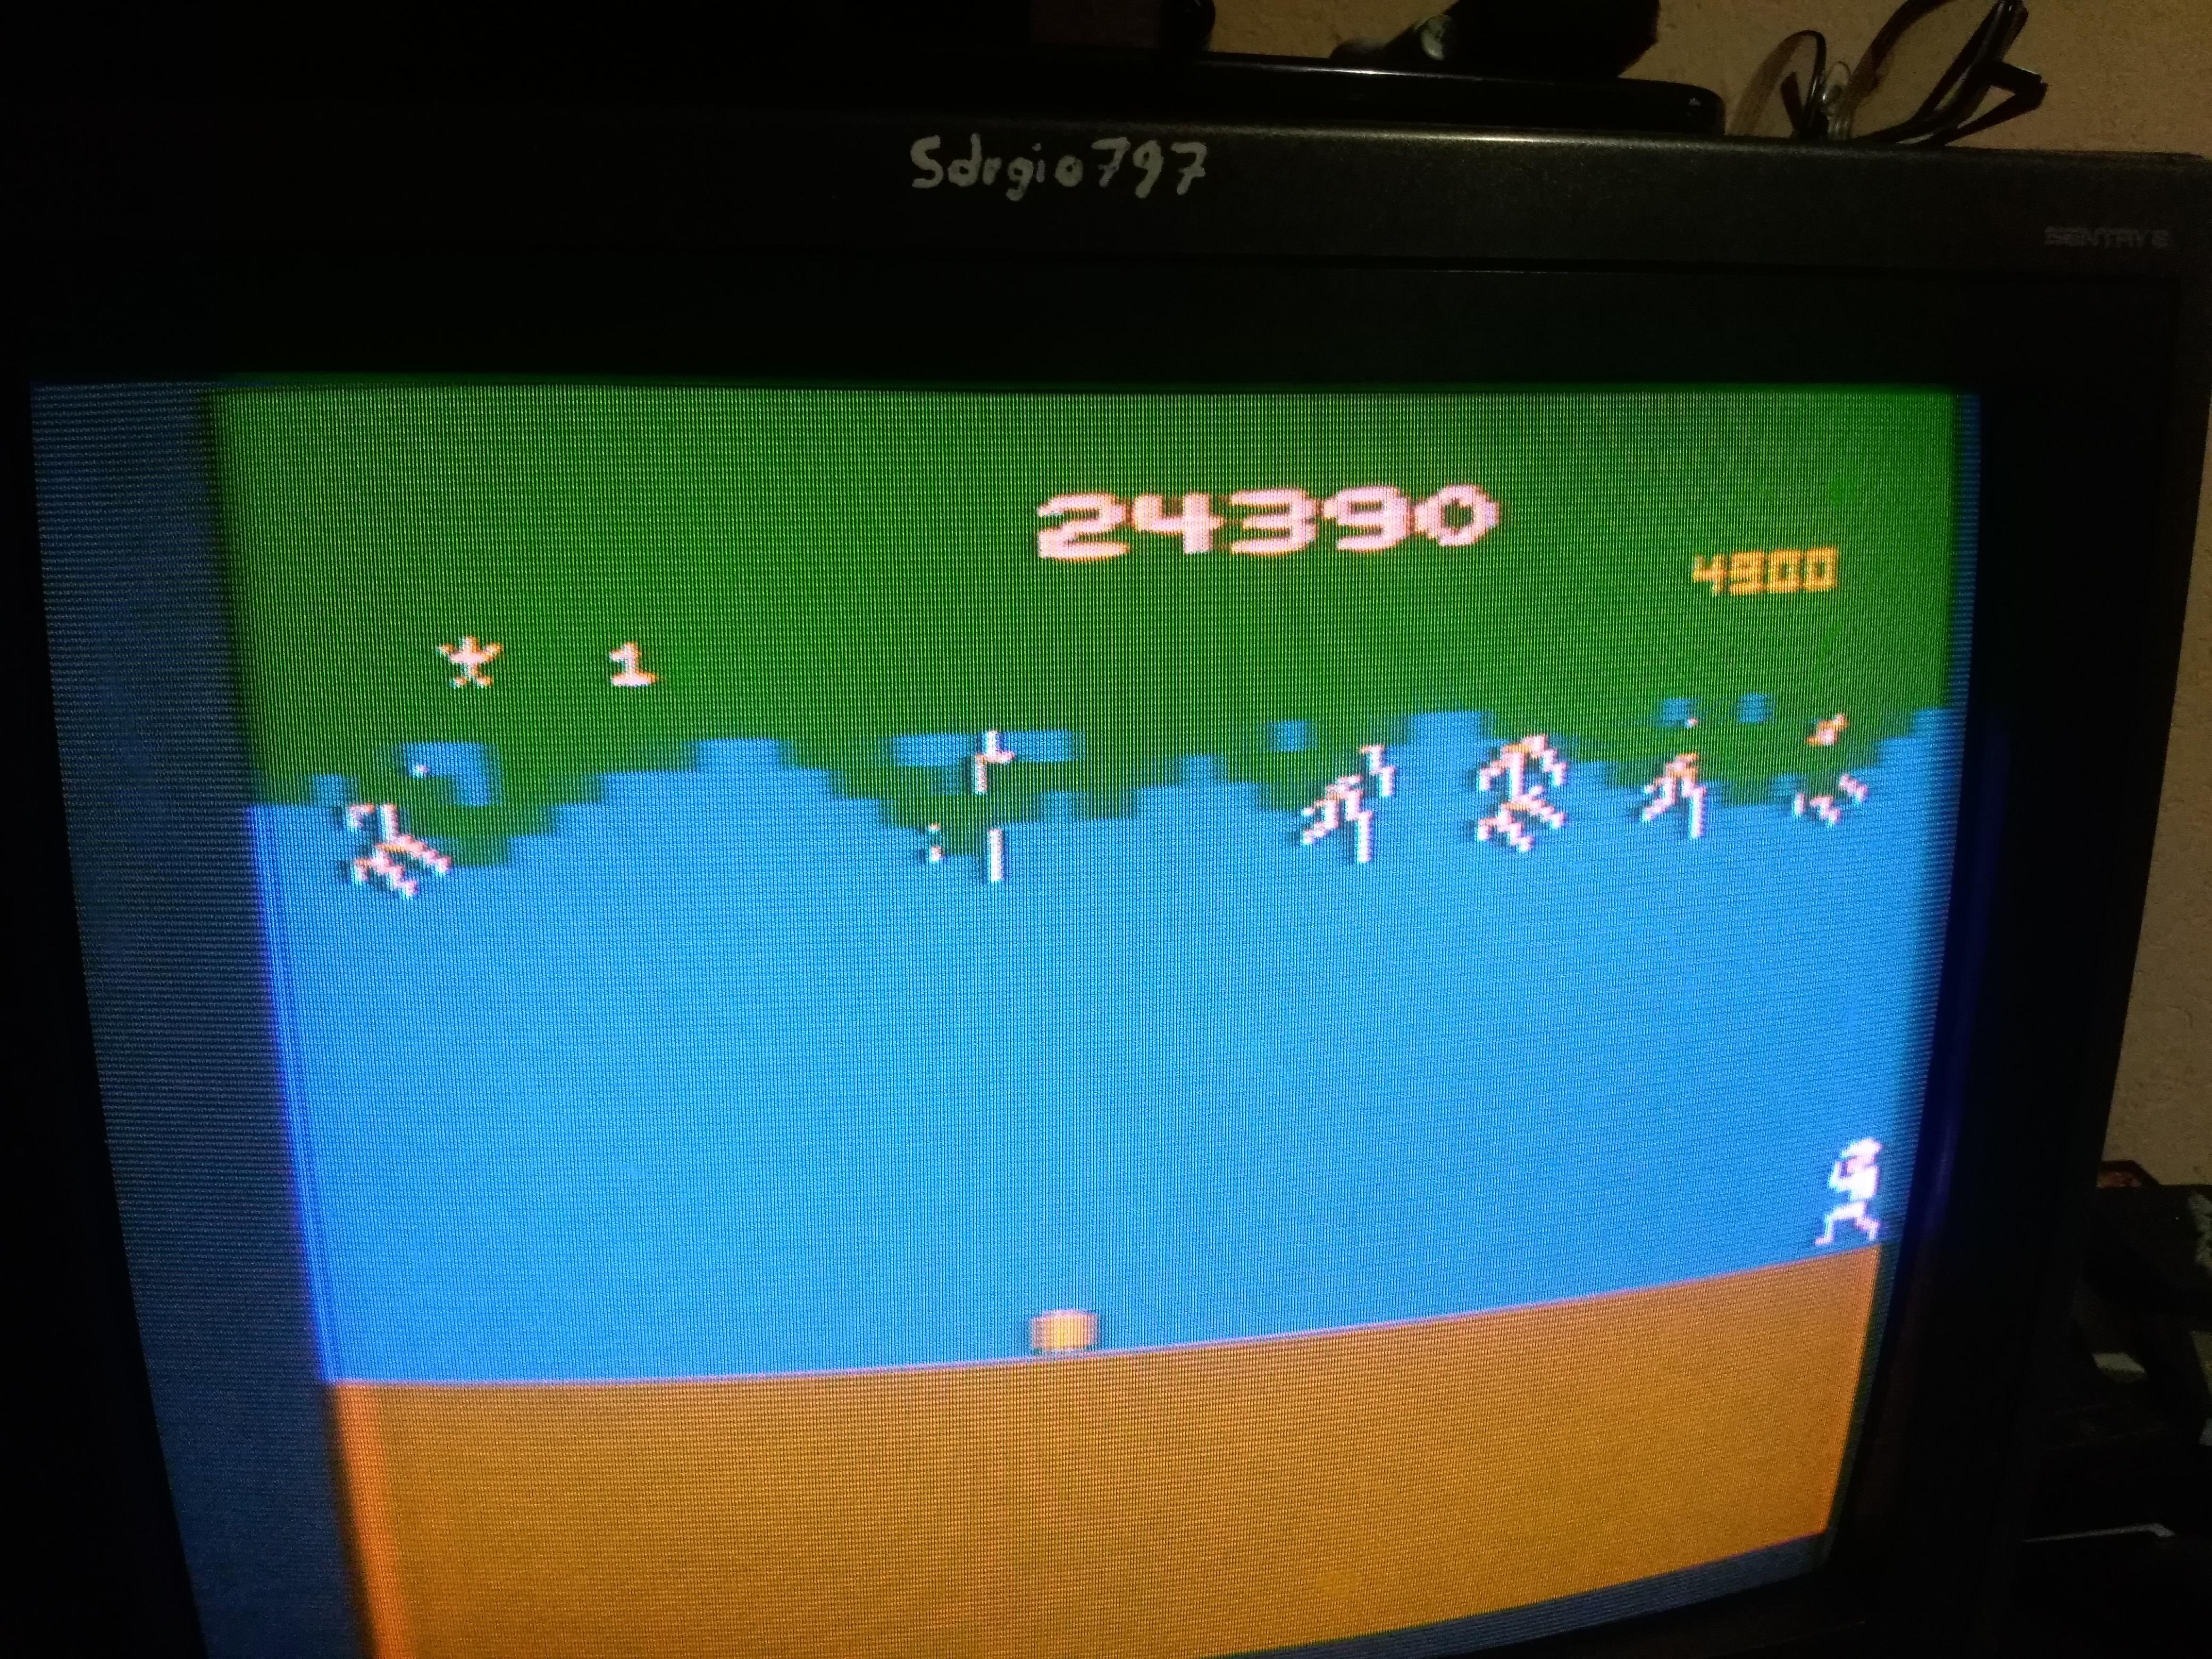 Sdrgio797: Jungle Hunt (Atari 2600) 24,390 points on 2020-06-28 03:07:40